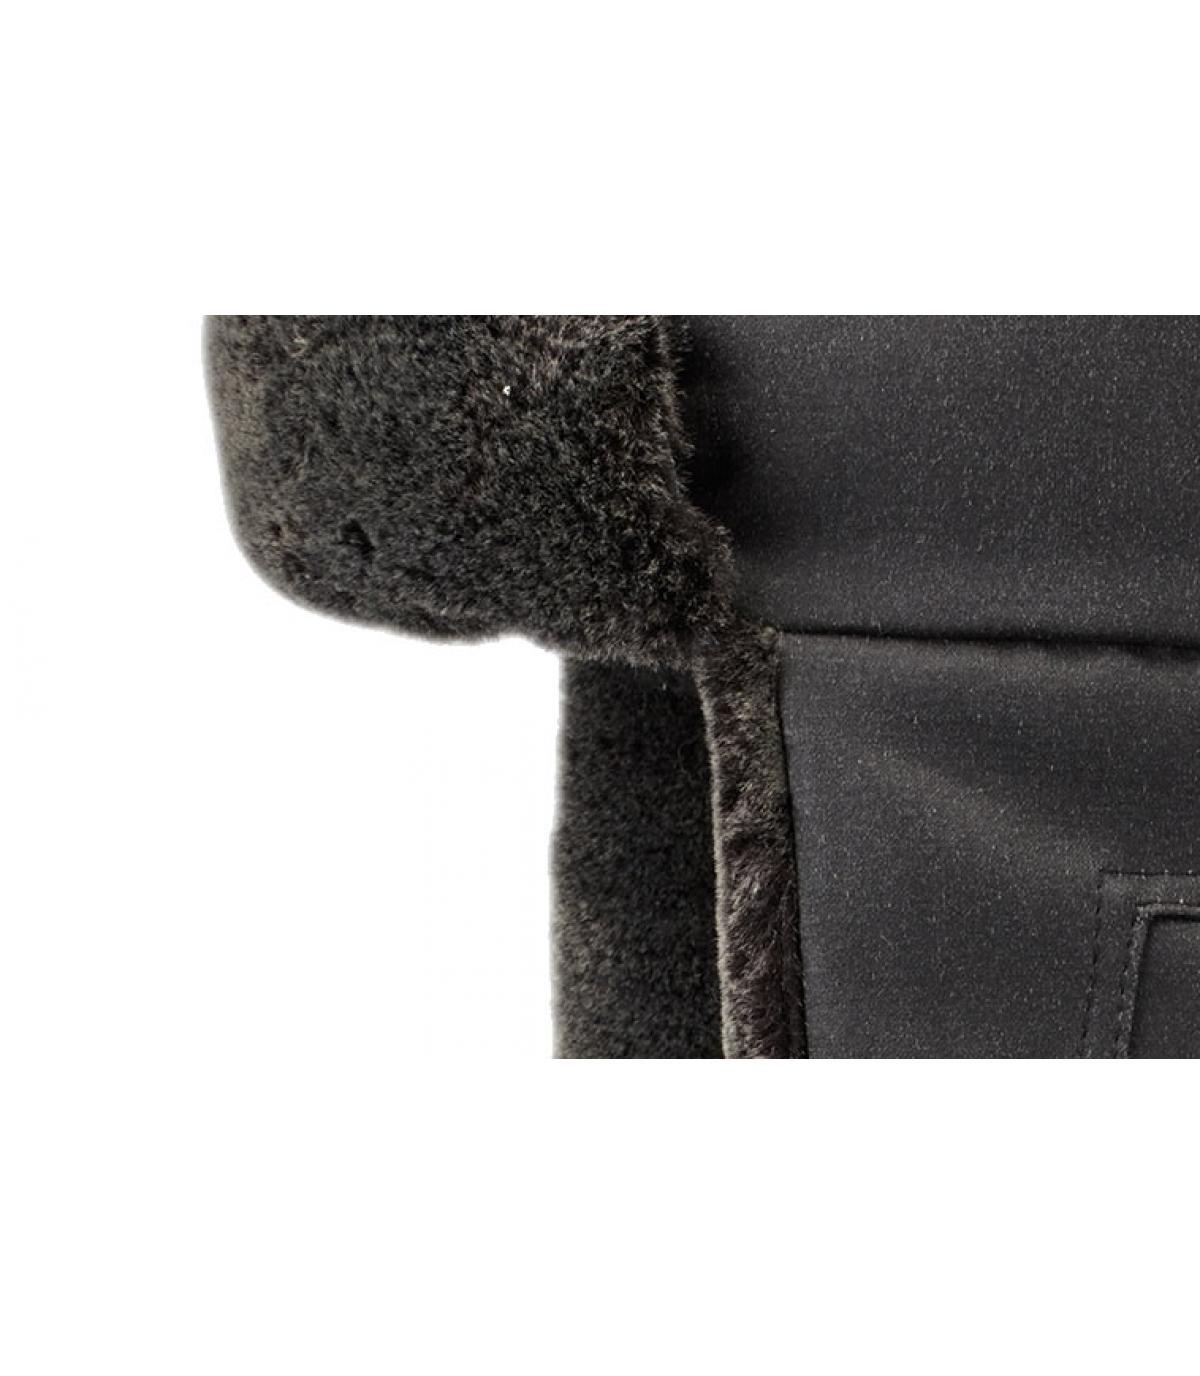 Detalles Bomber Cap CO PE Fake Fur black imagen 3